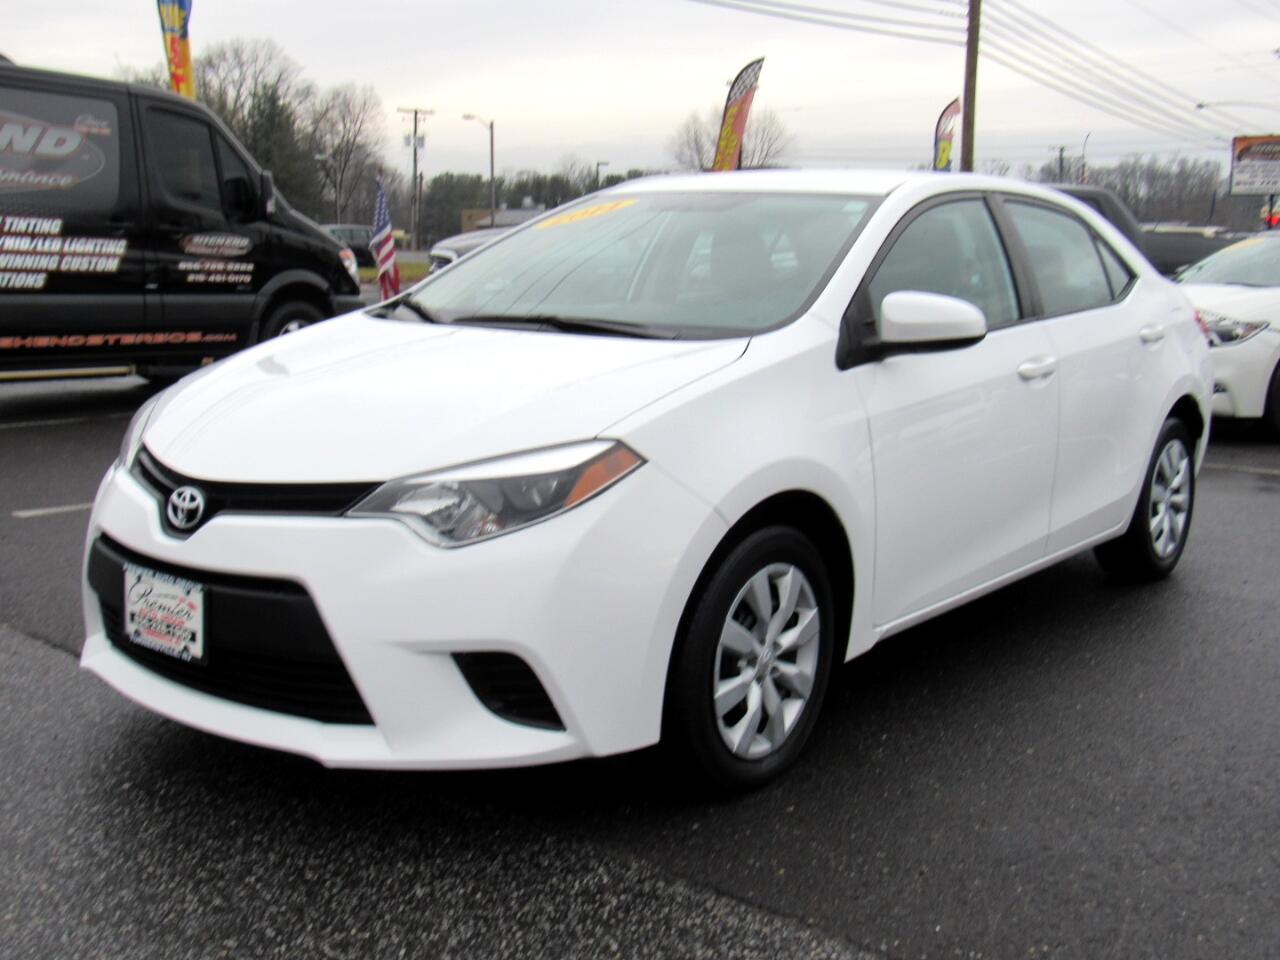 Toyota Corolla 4dr Sdn CVT LE Premium (Natl) 2014